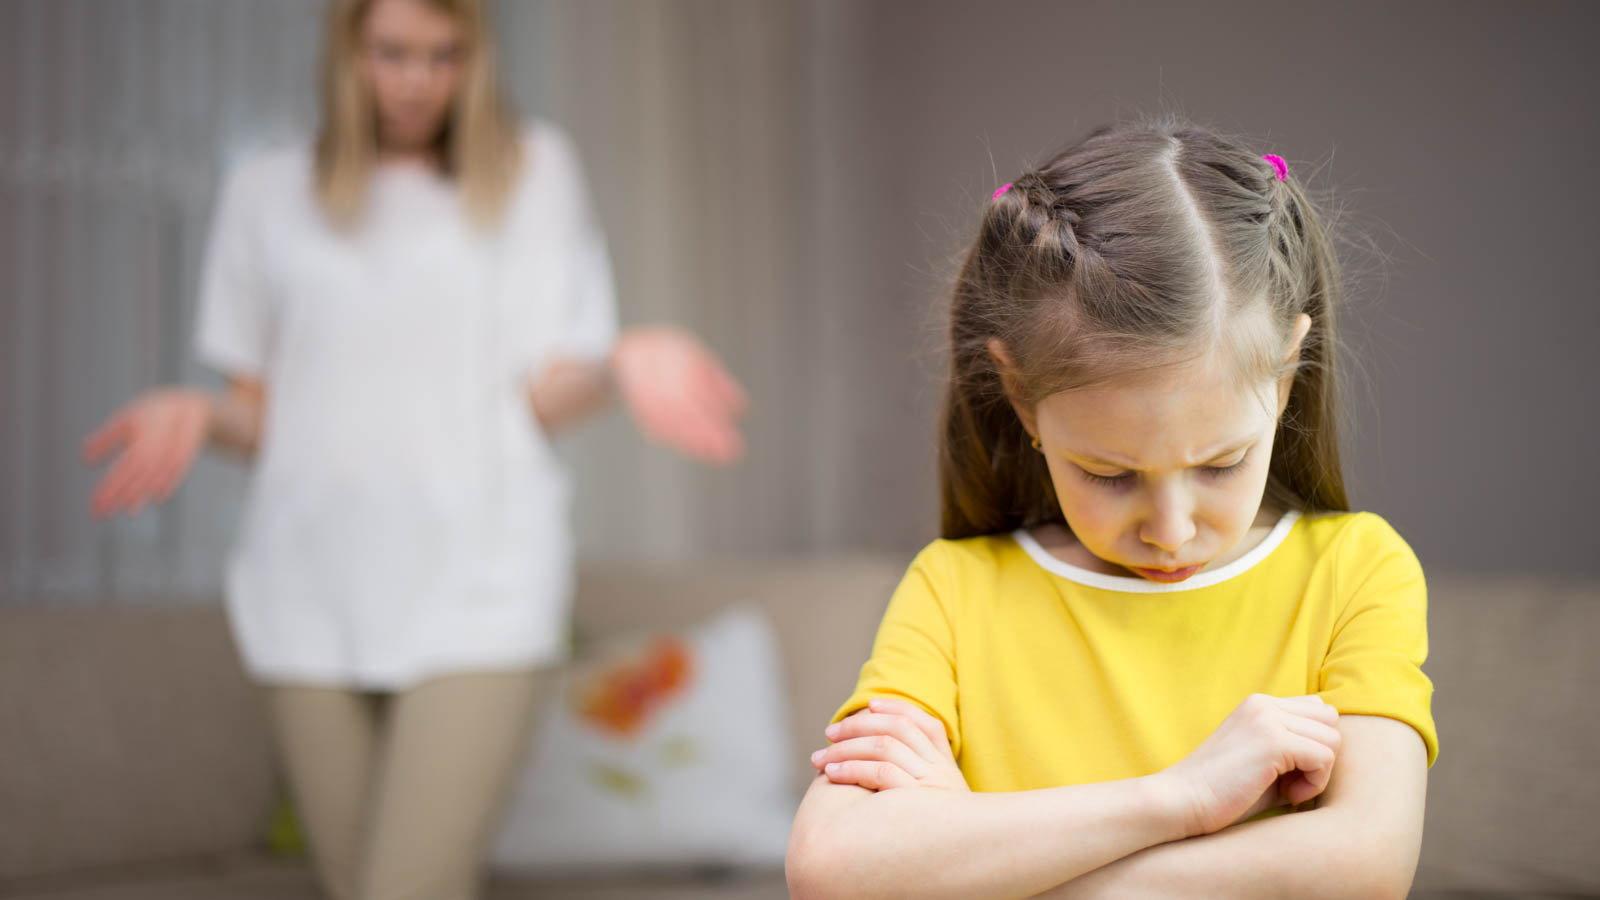 mom scolding child